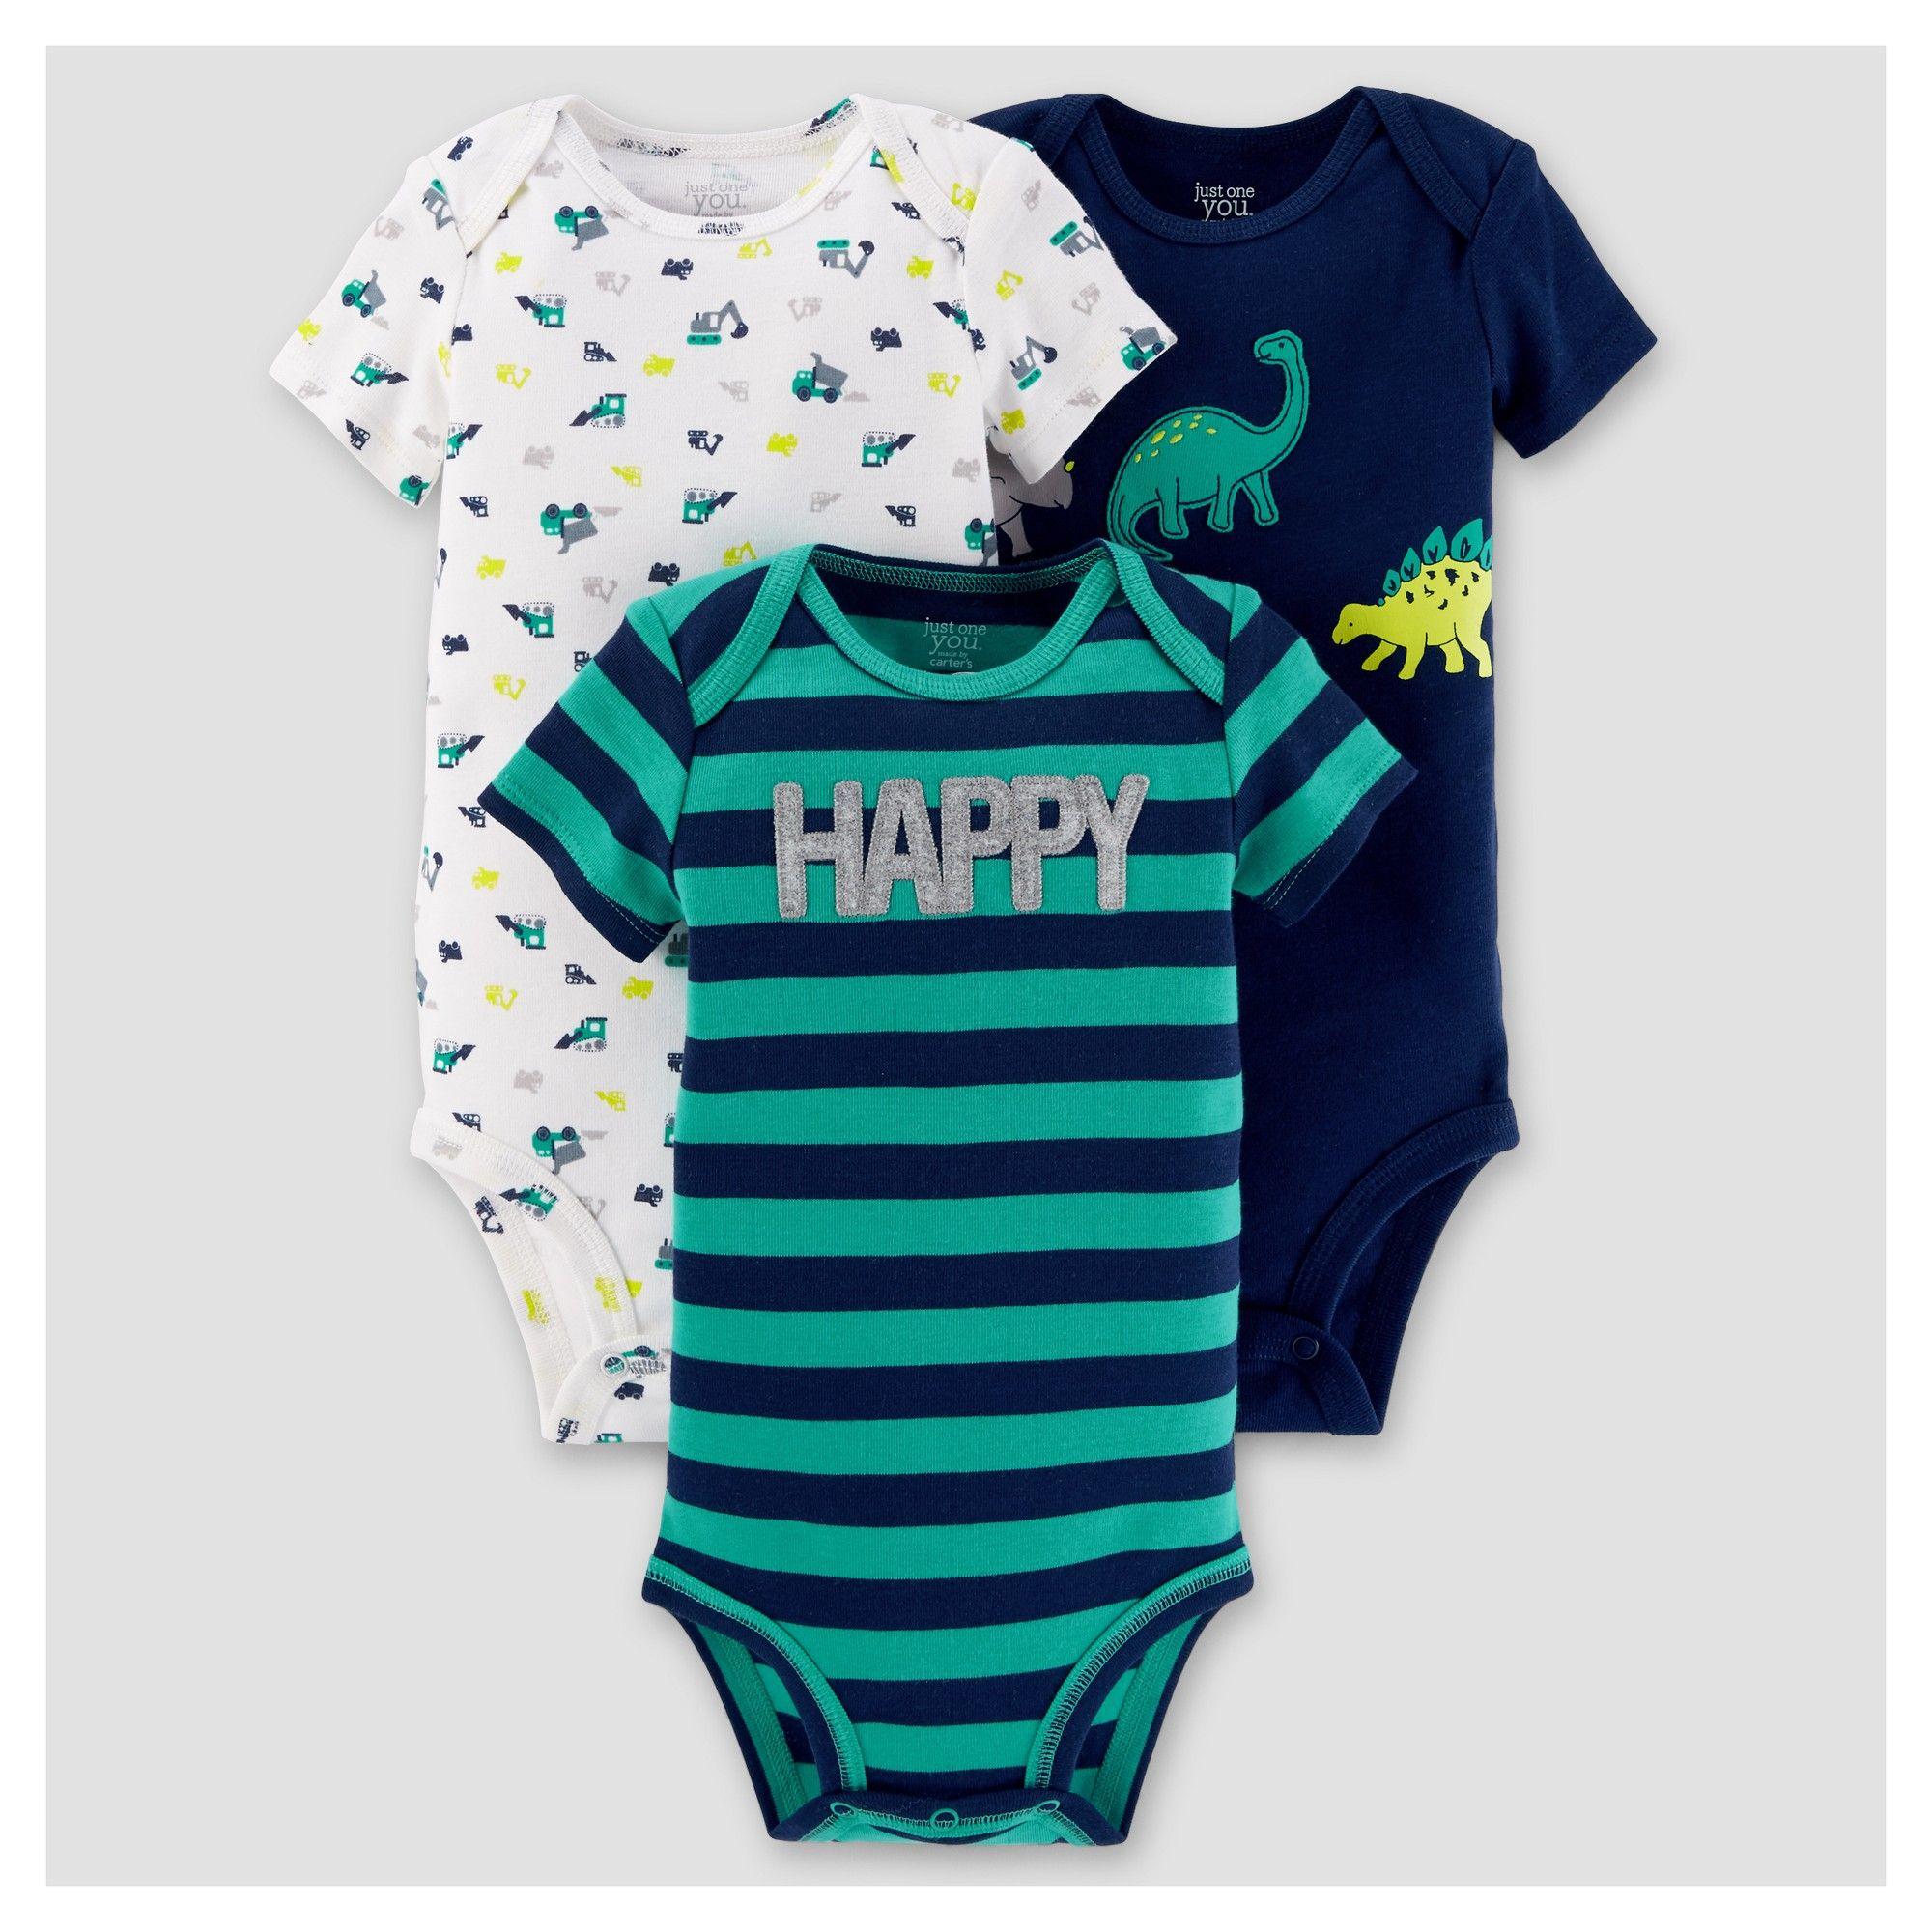 Baby Boys 3pk Short Sleeve Dinosaurs Bodysuit Just e You Made